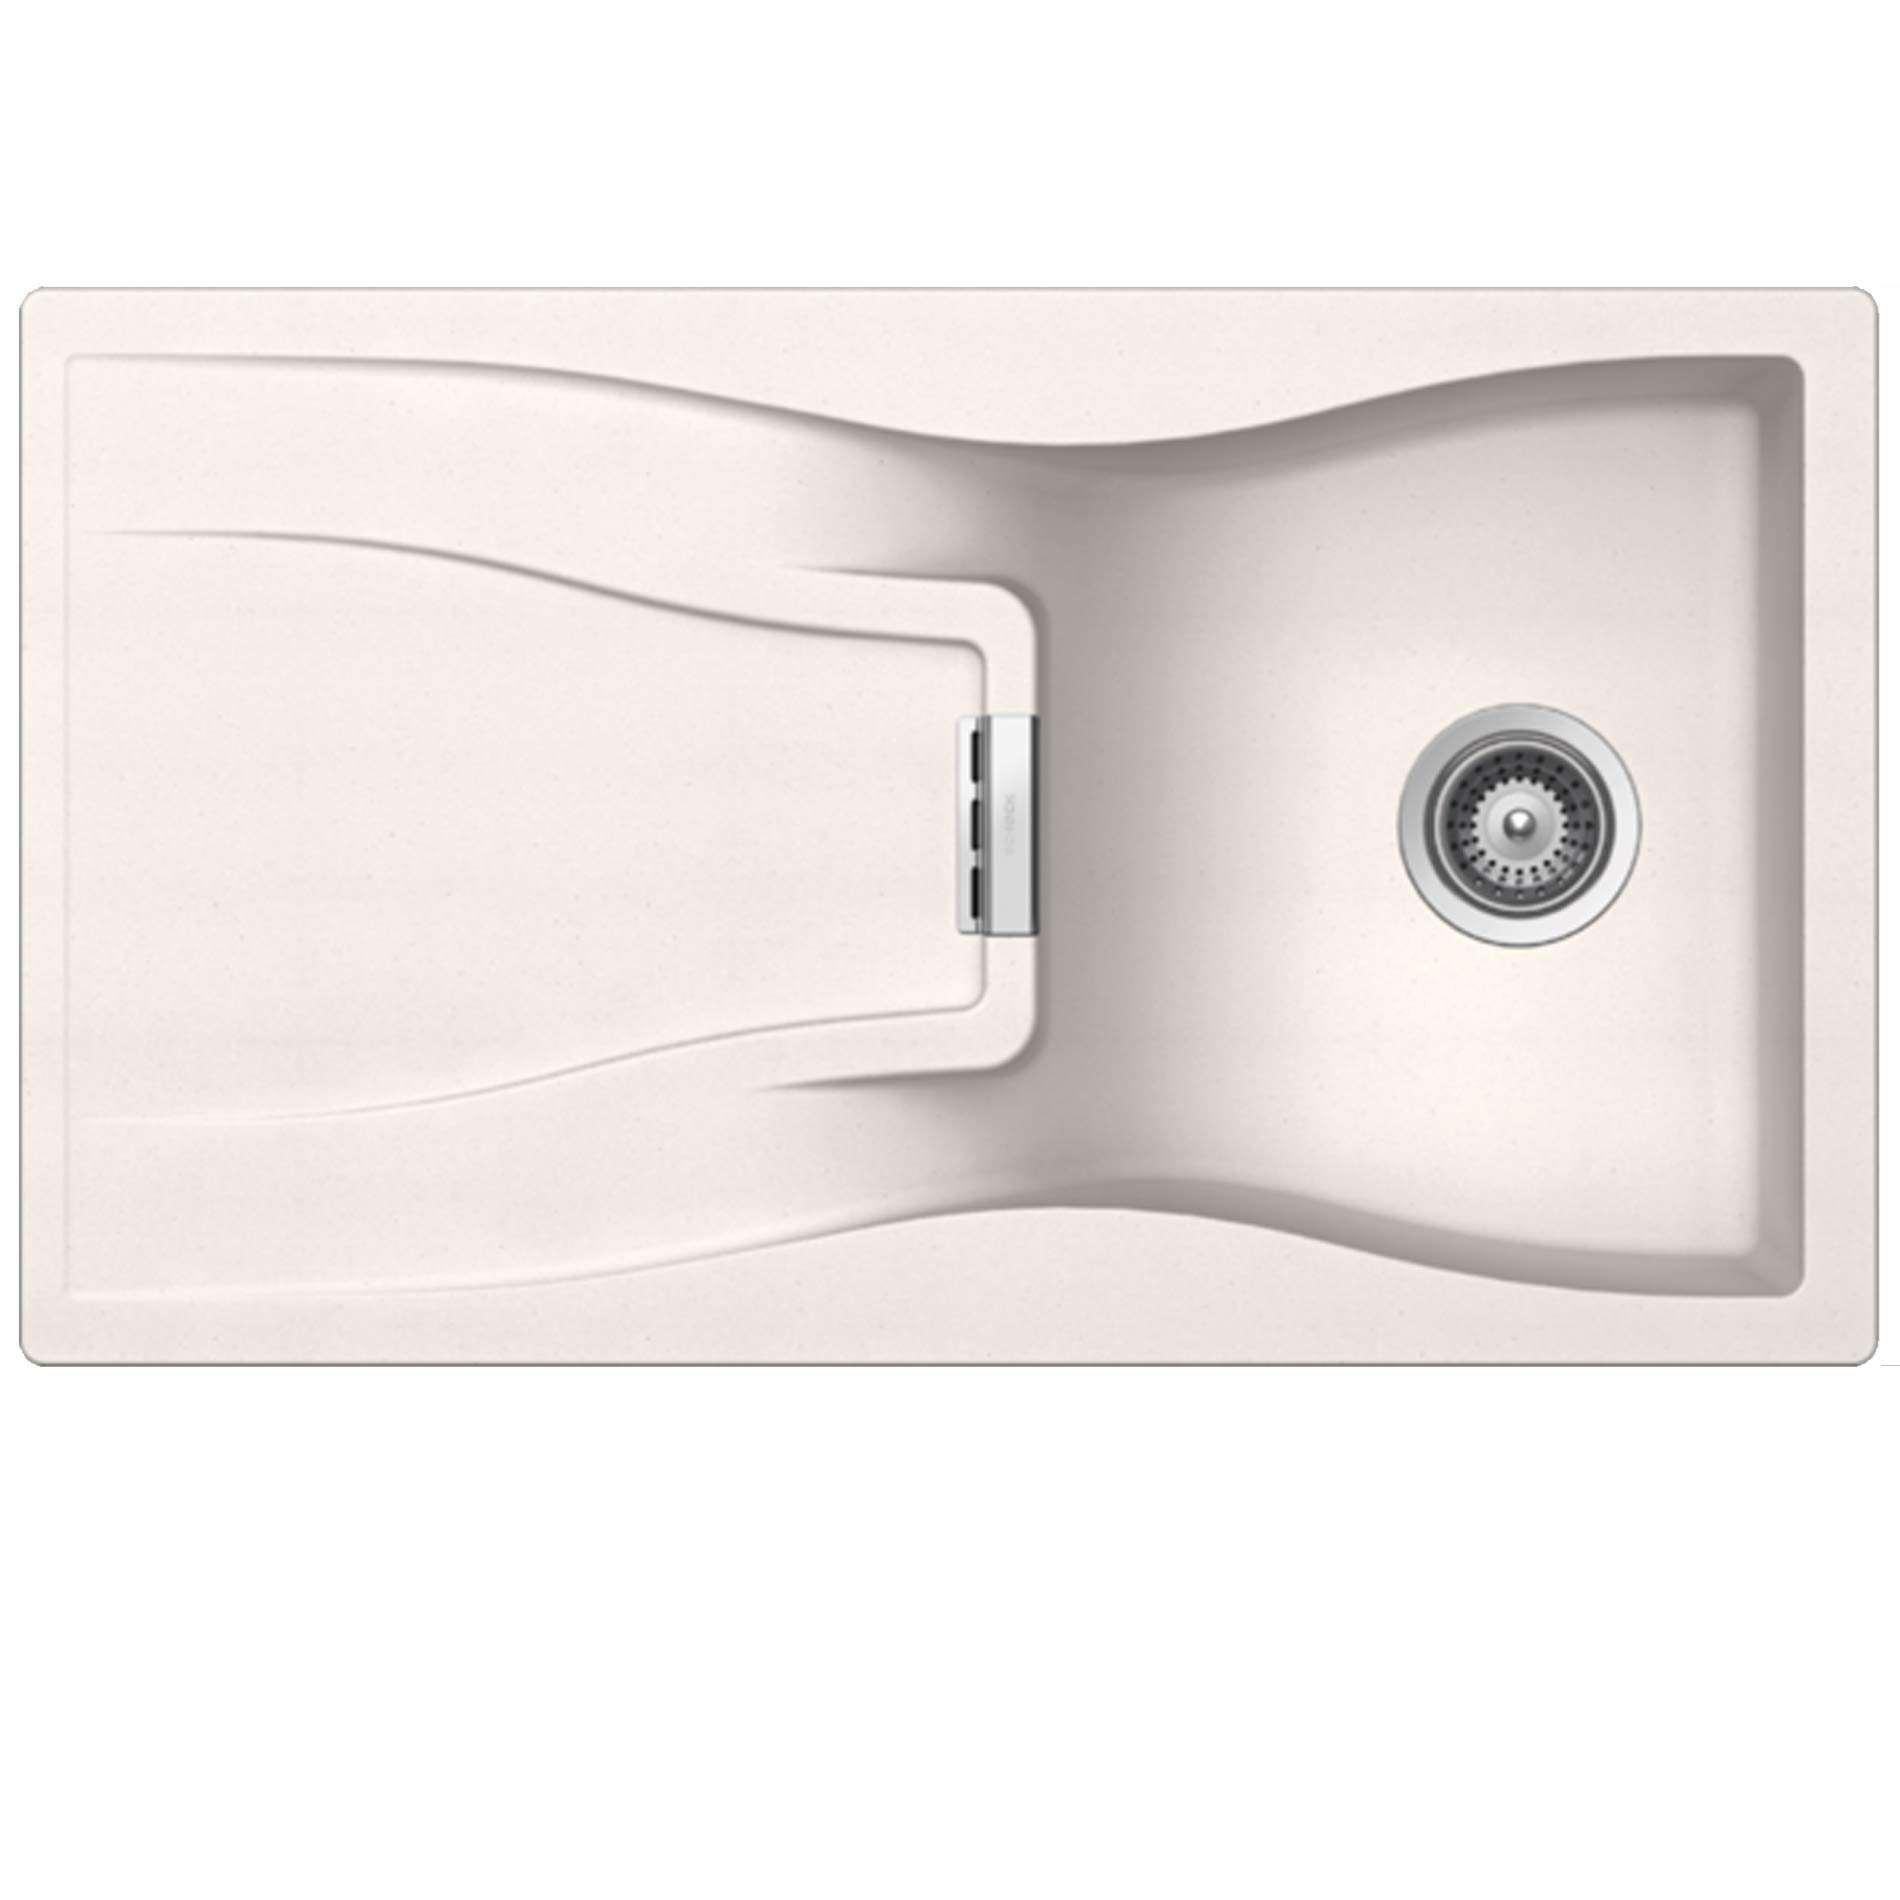 Picture of Waterfall WAT D 100 Polaris Granite Sink